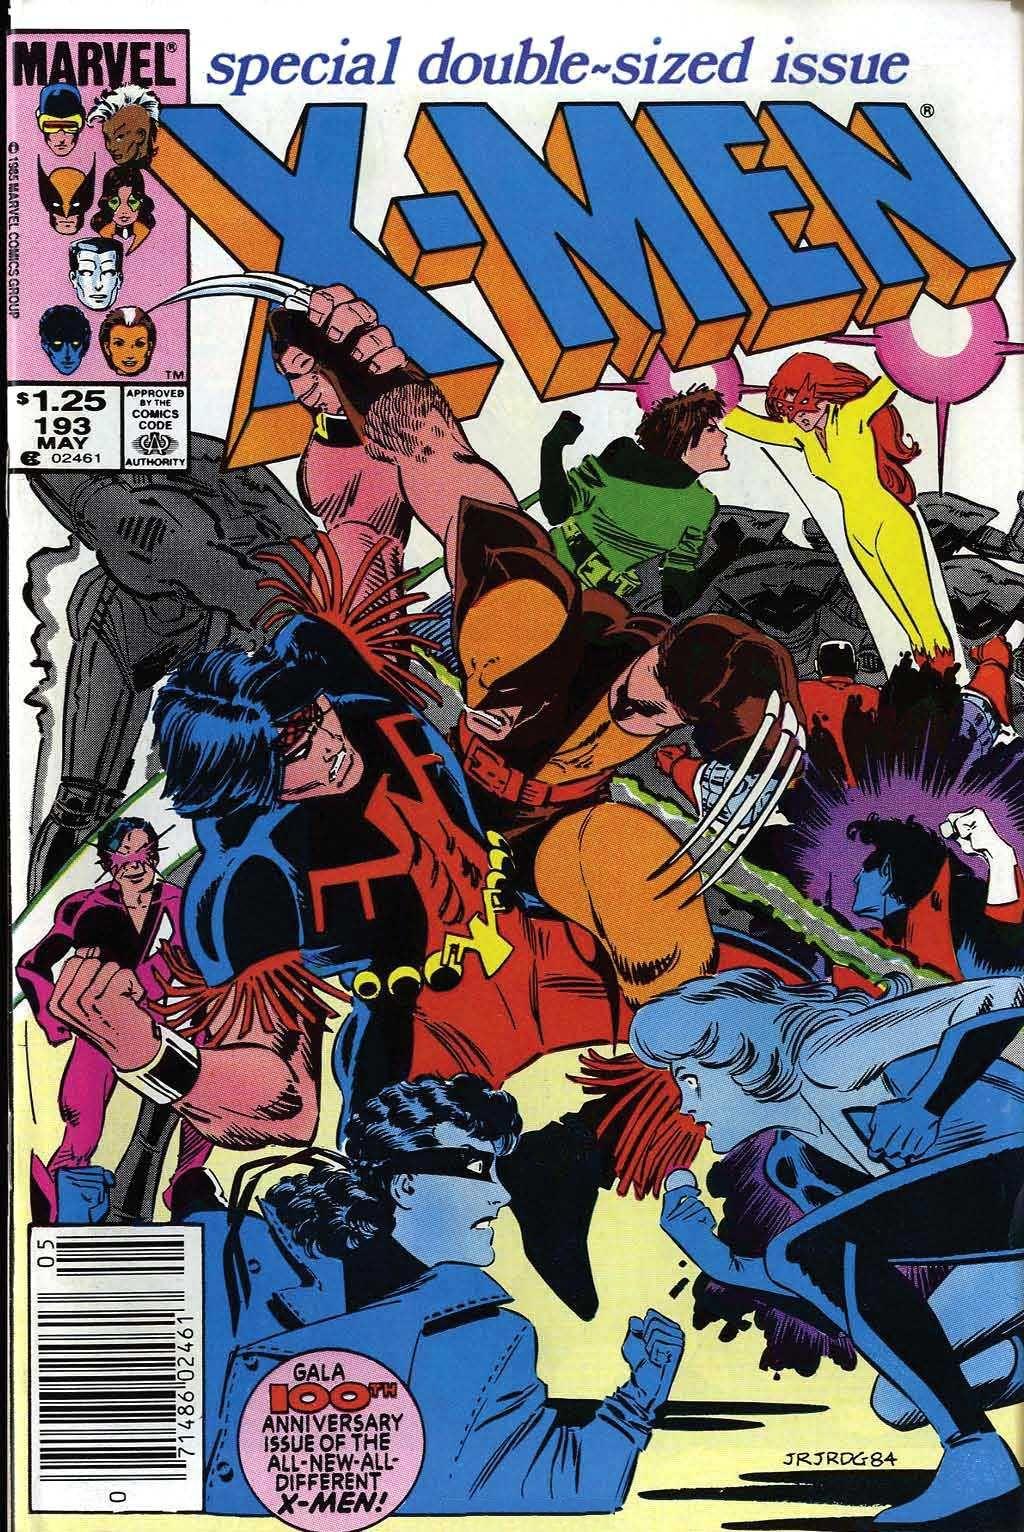 John persons comics for sale - Back To Title Selection Comics U Uncanny X Men Vol 1 Continues From